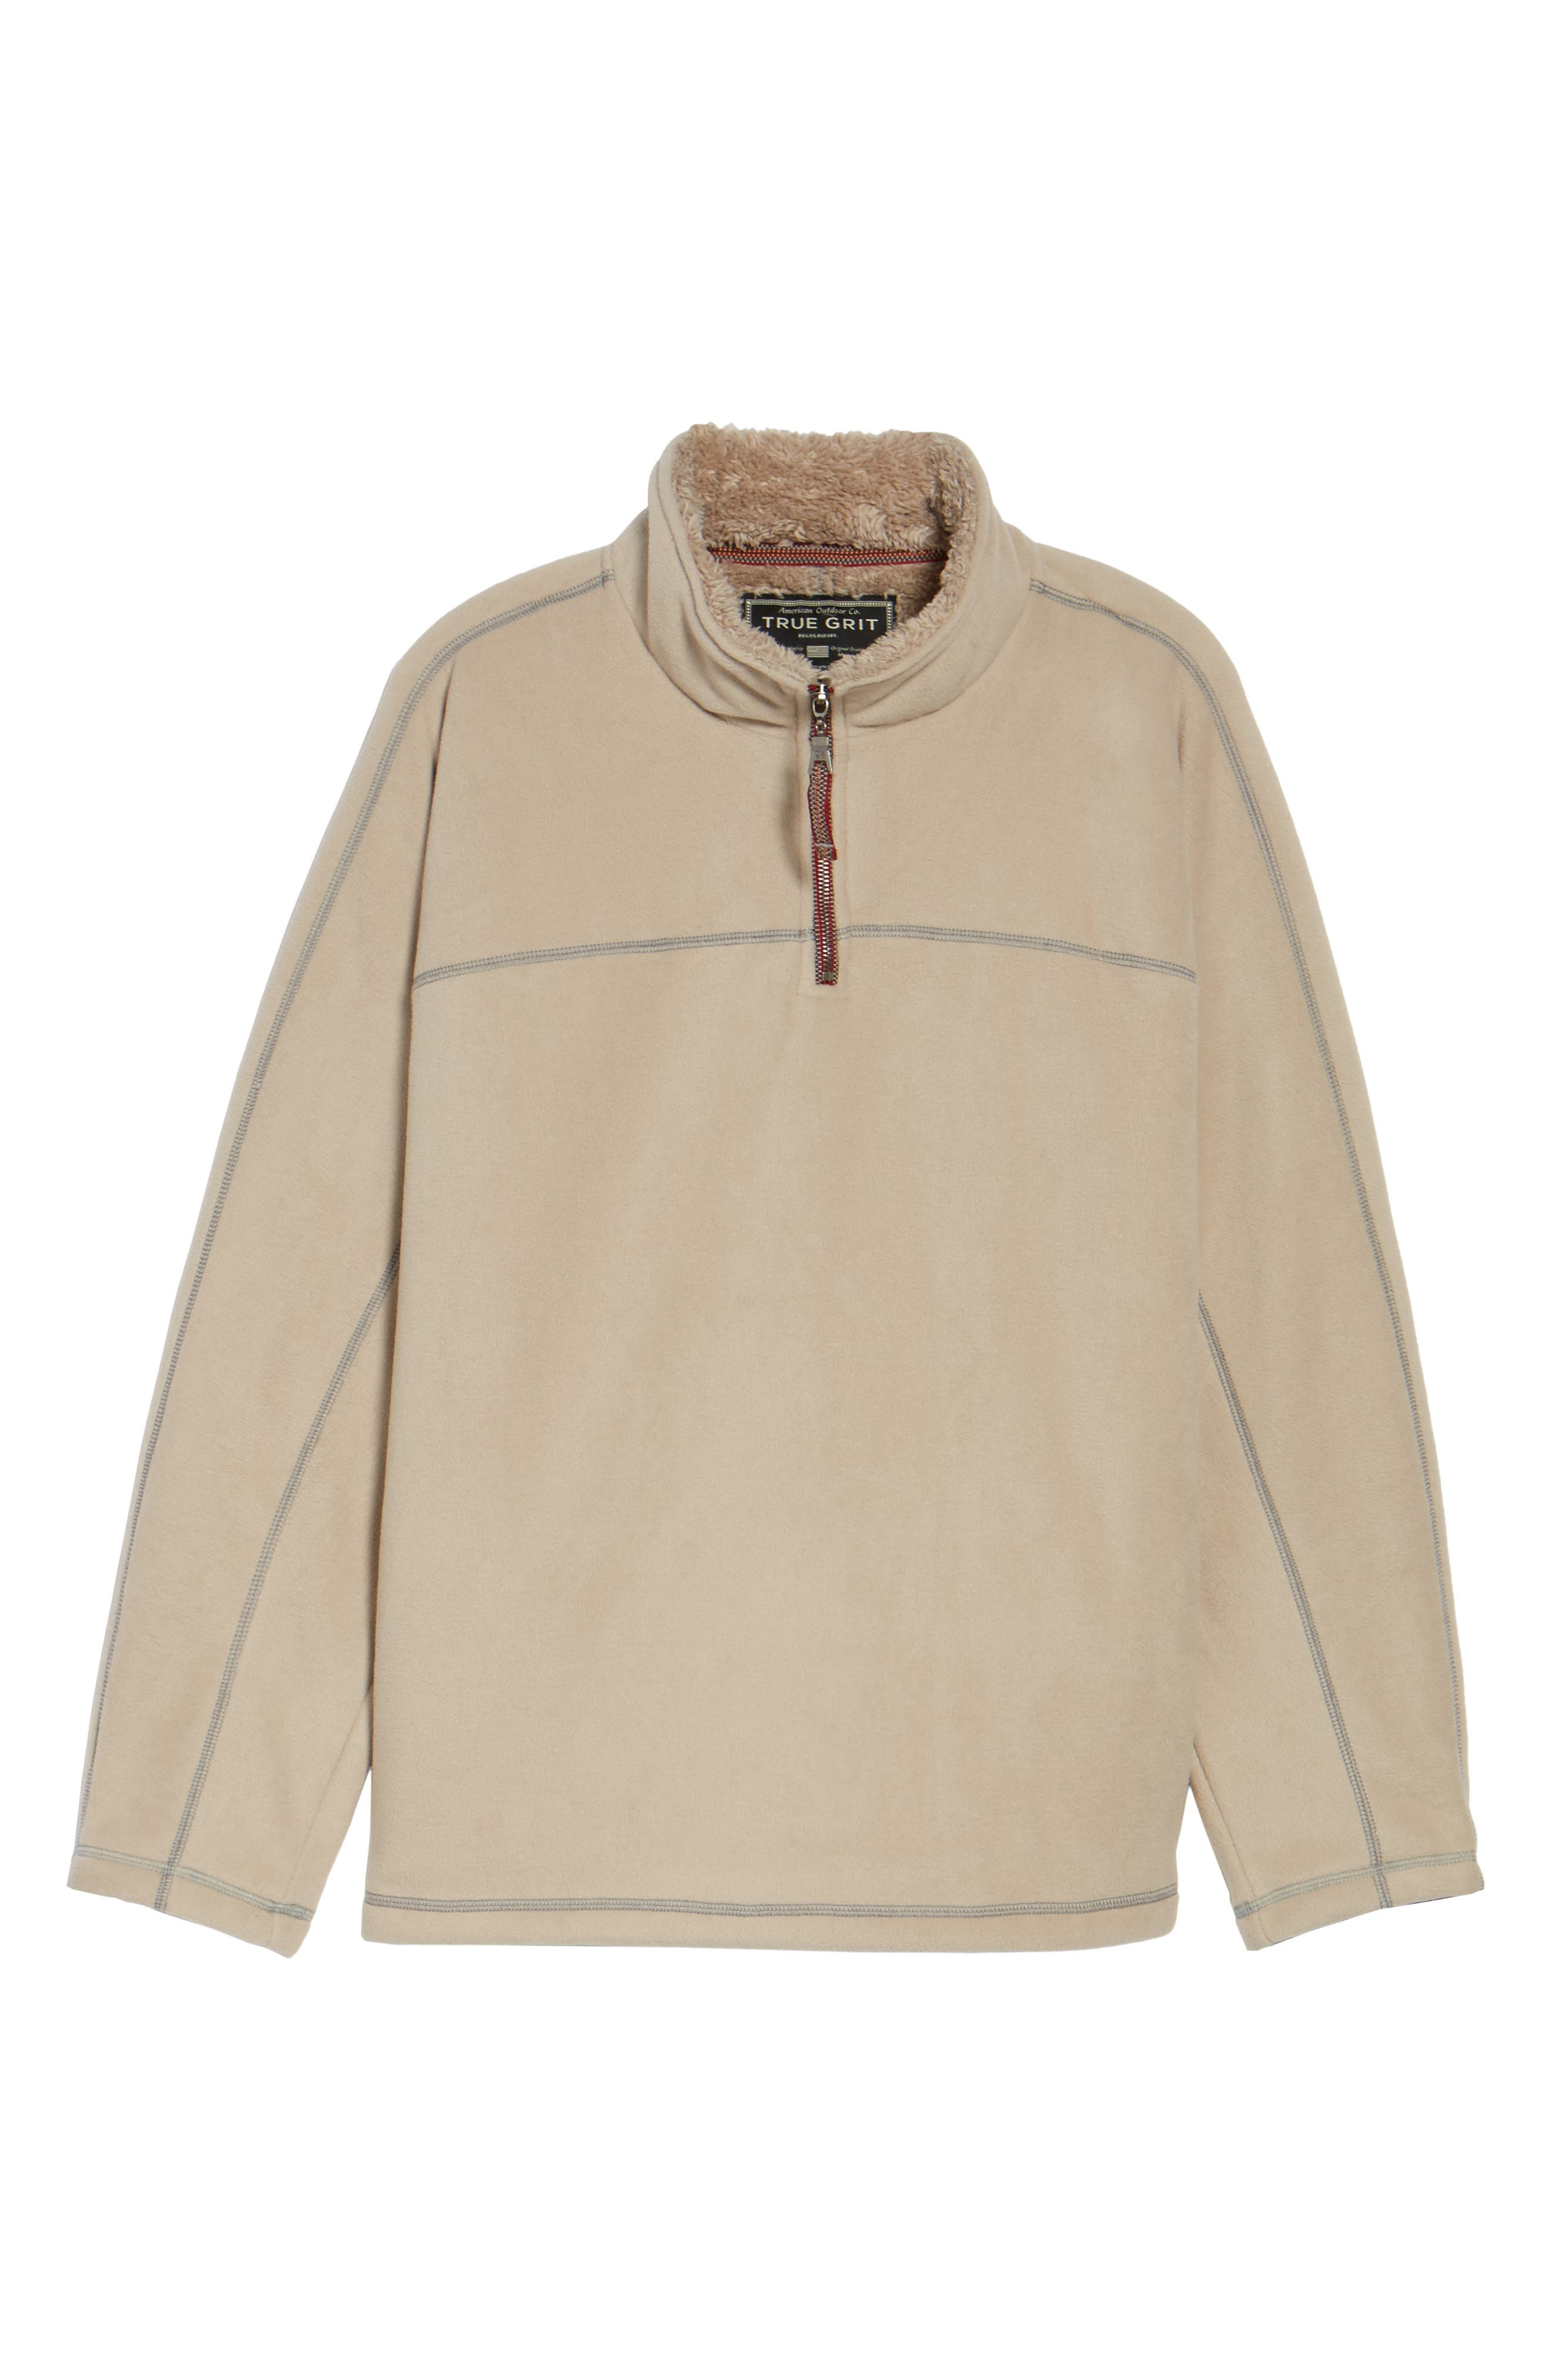 Bonded Polar Fleece Lined Pullover,                             Alternate thumbnail 6, color,                             Sand